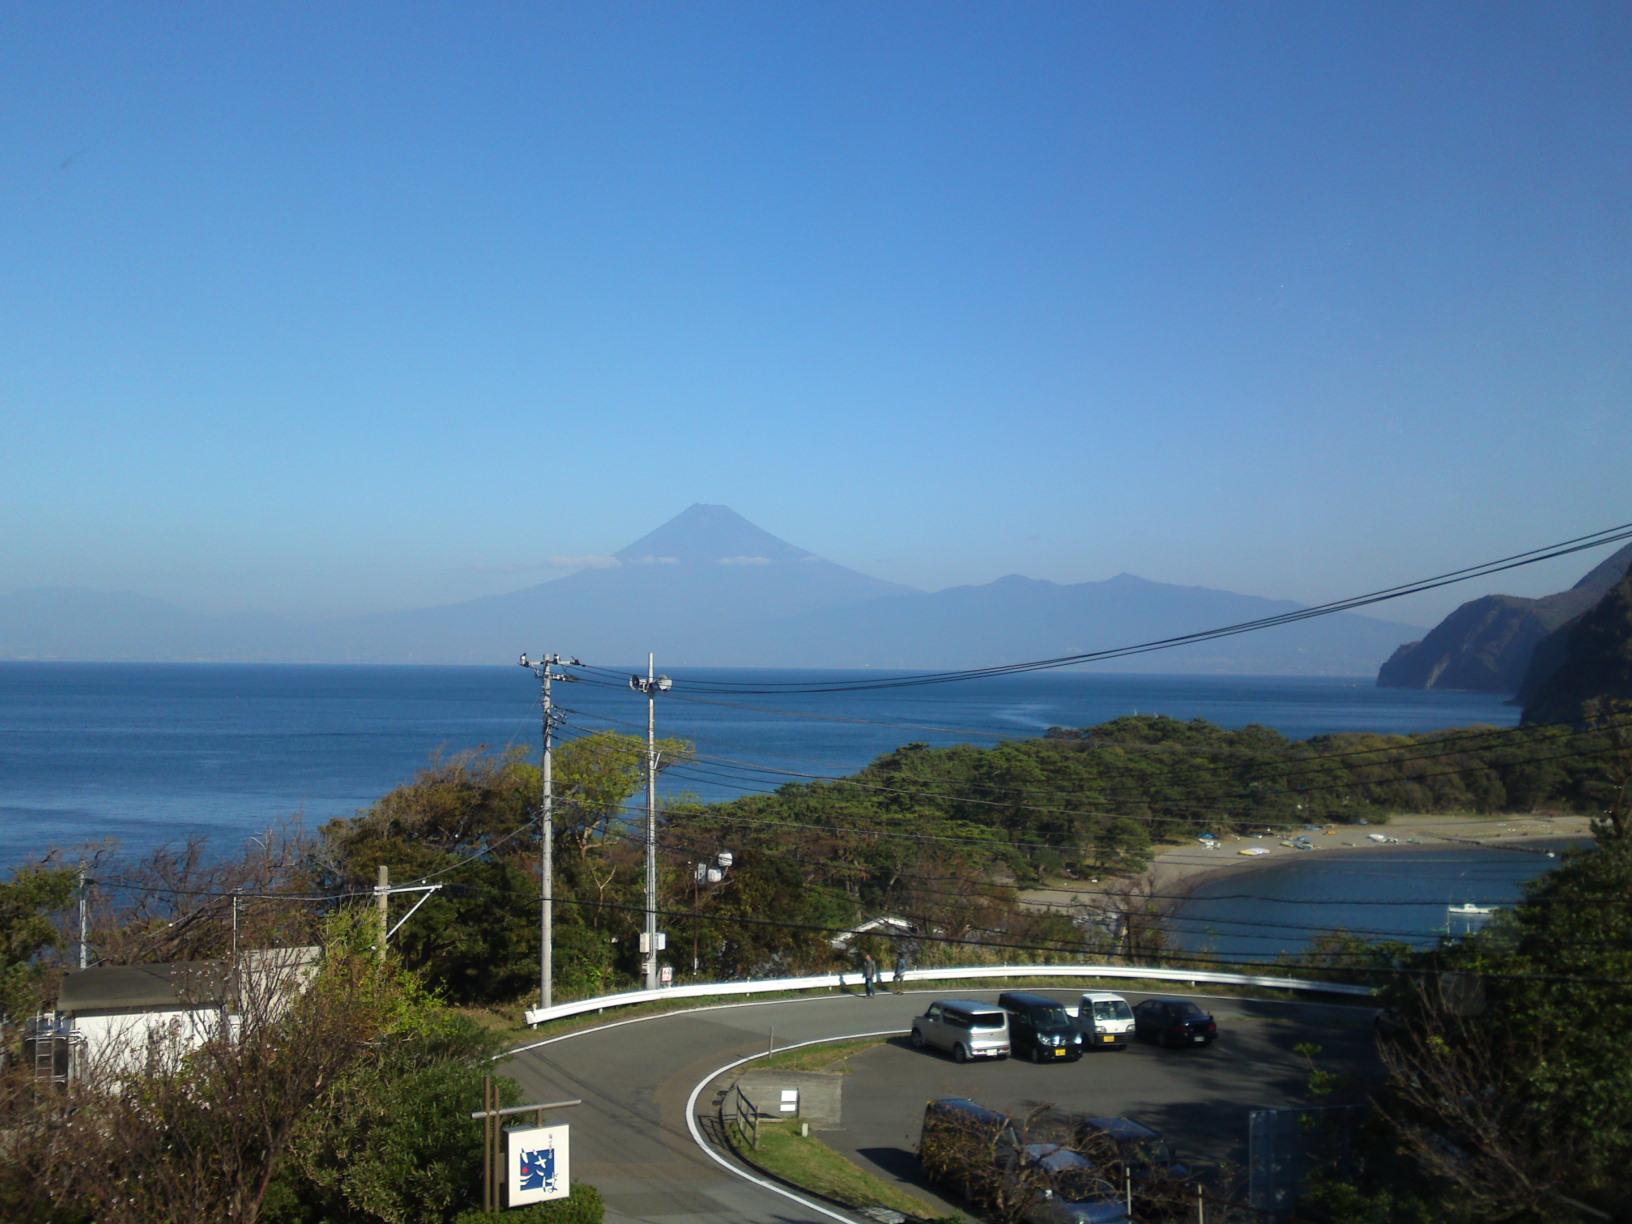 Heda Izu Peninsula Mount Fuji view beach